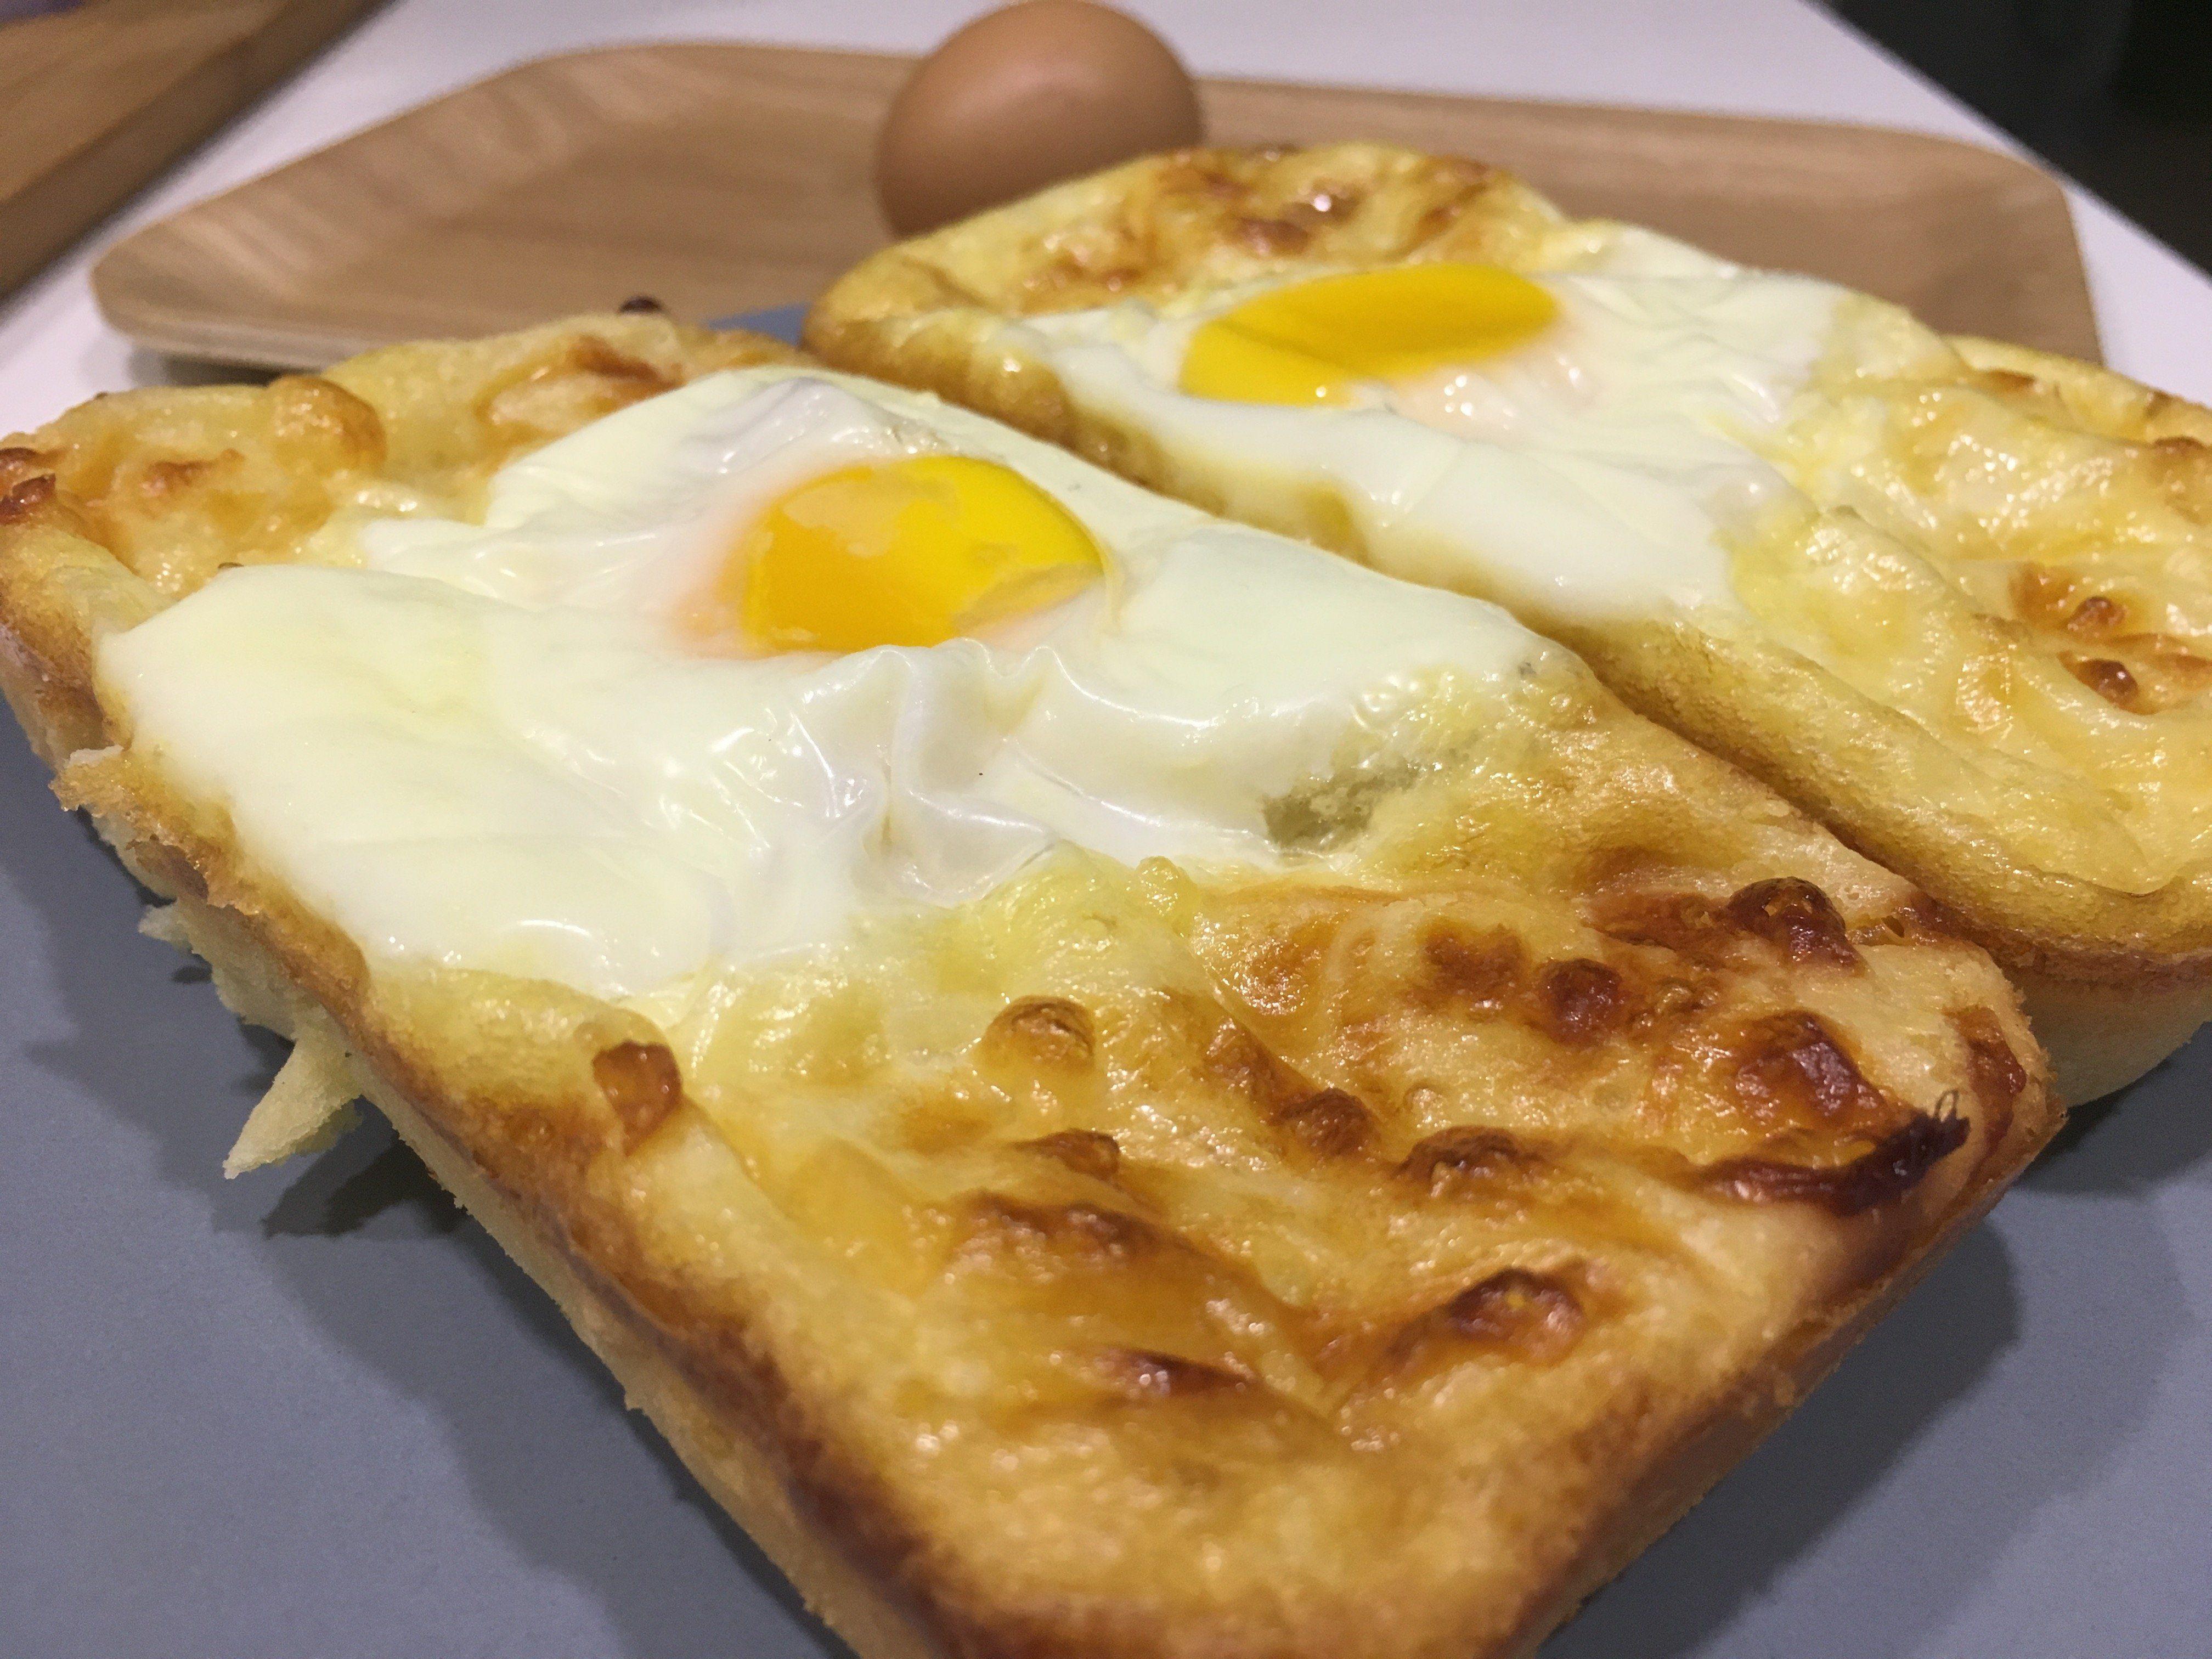 Pin Oleh Tasya Elsia Di Resep Sandwich Makanan Manis Resep Sandwich Makanan